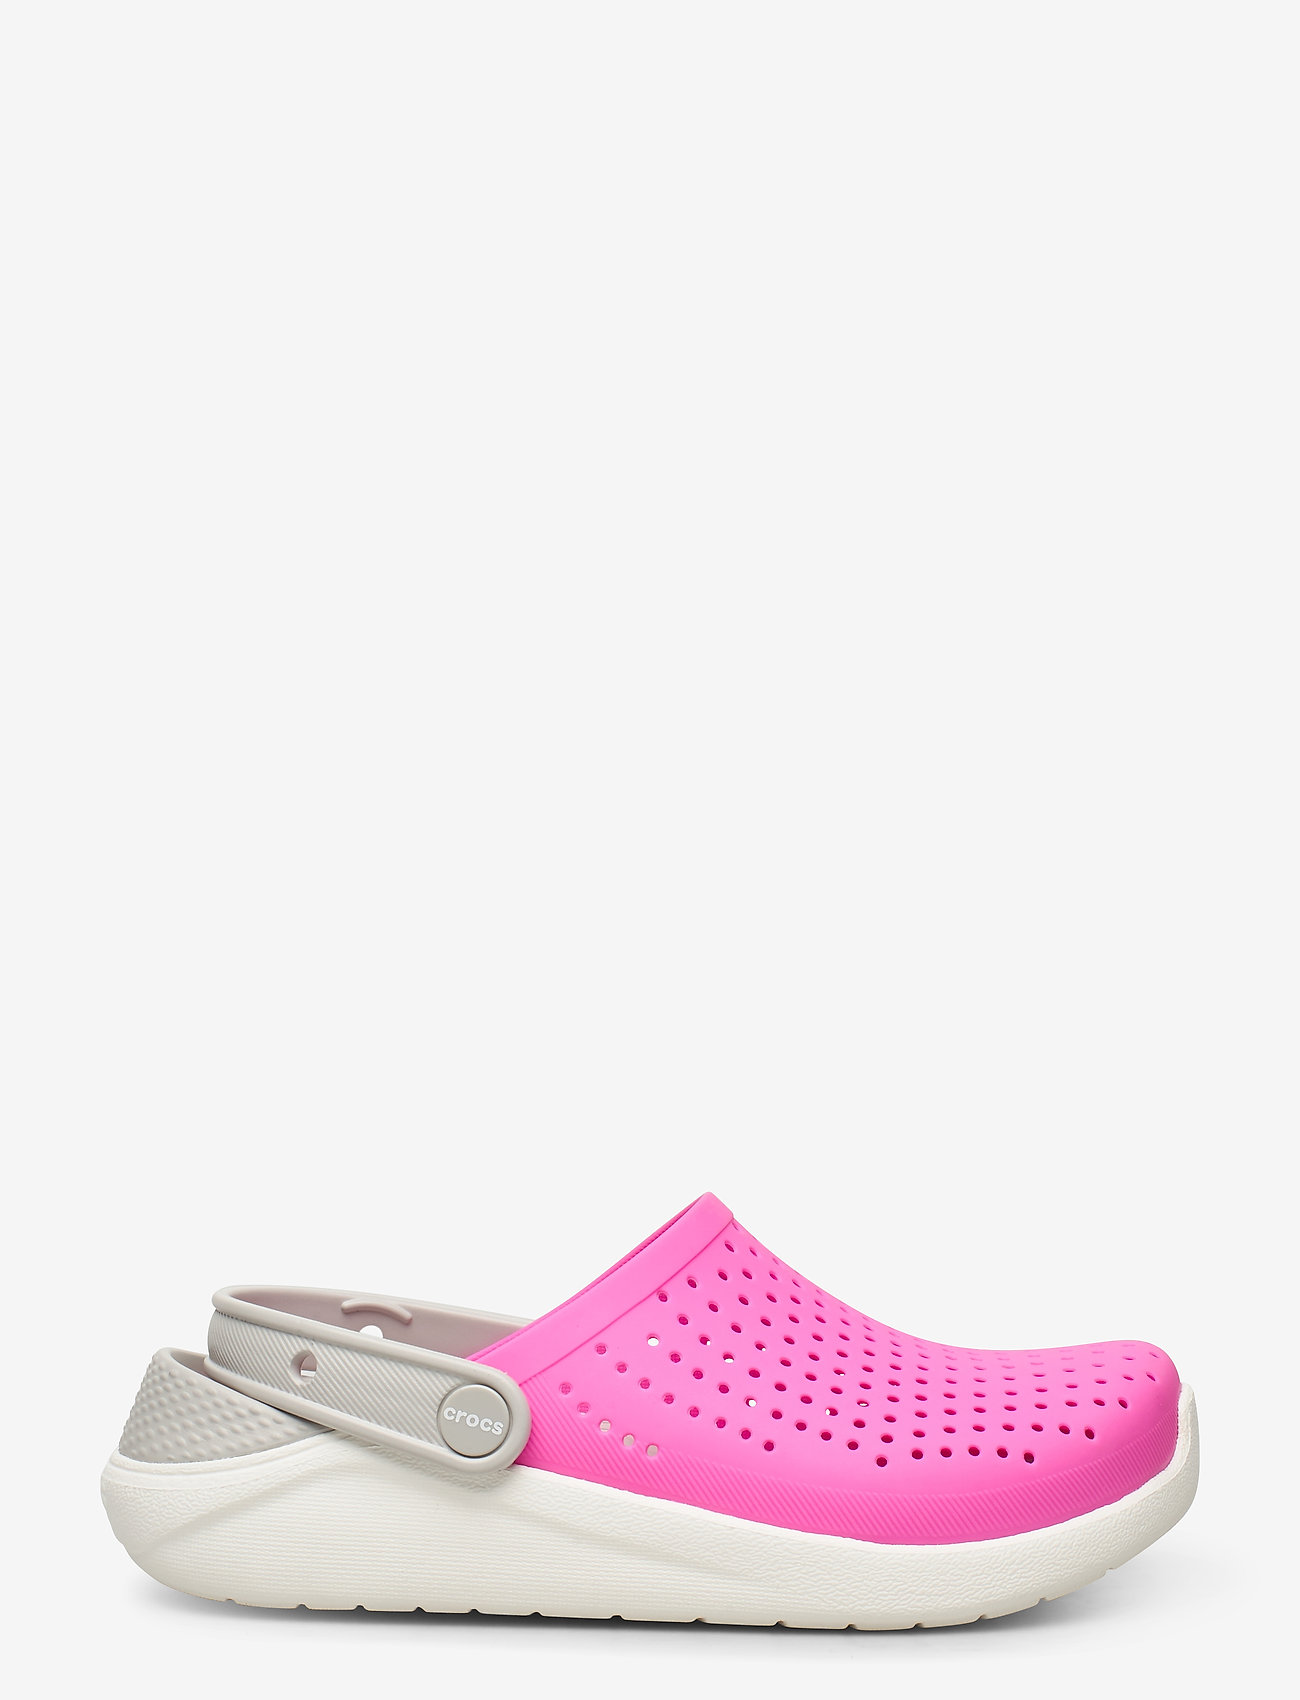 Crocs - LiteRide Clog K - electric pink/white - 1